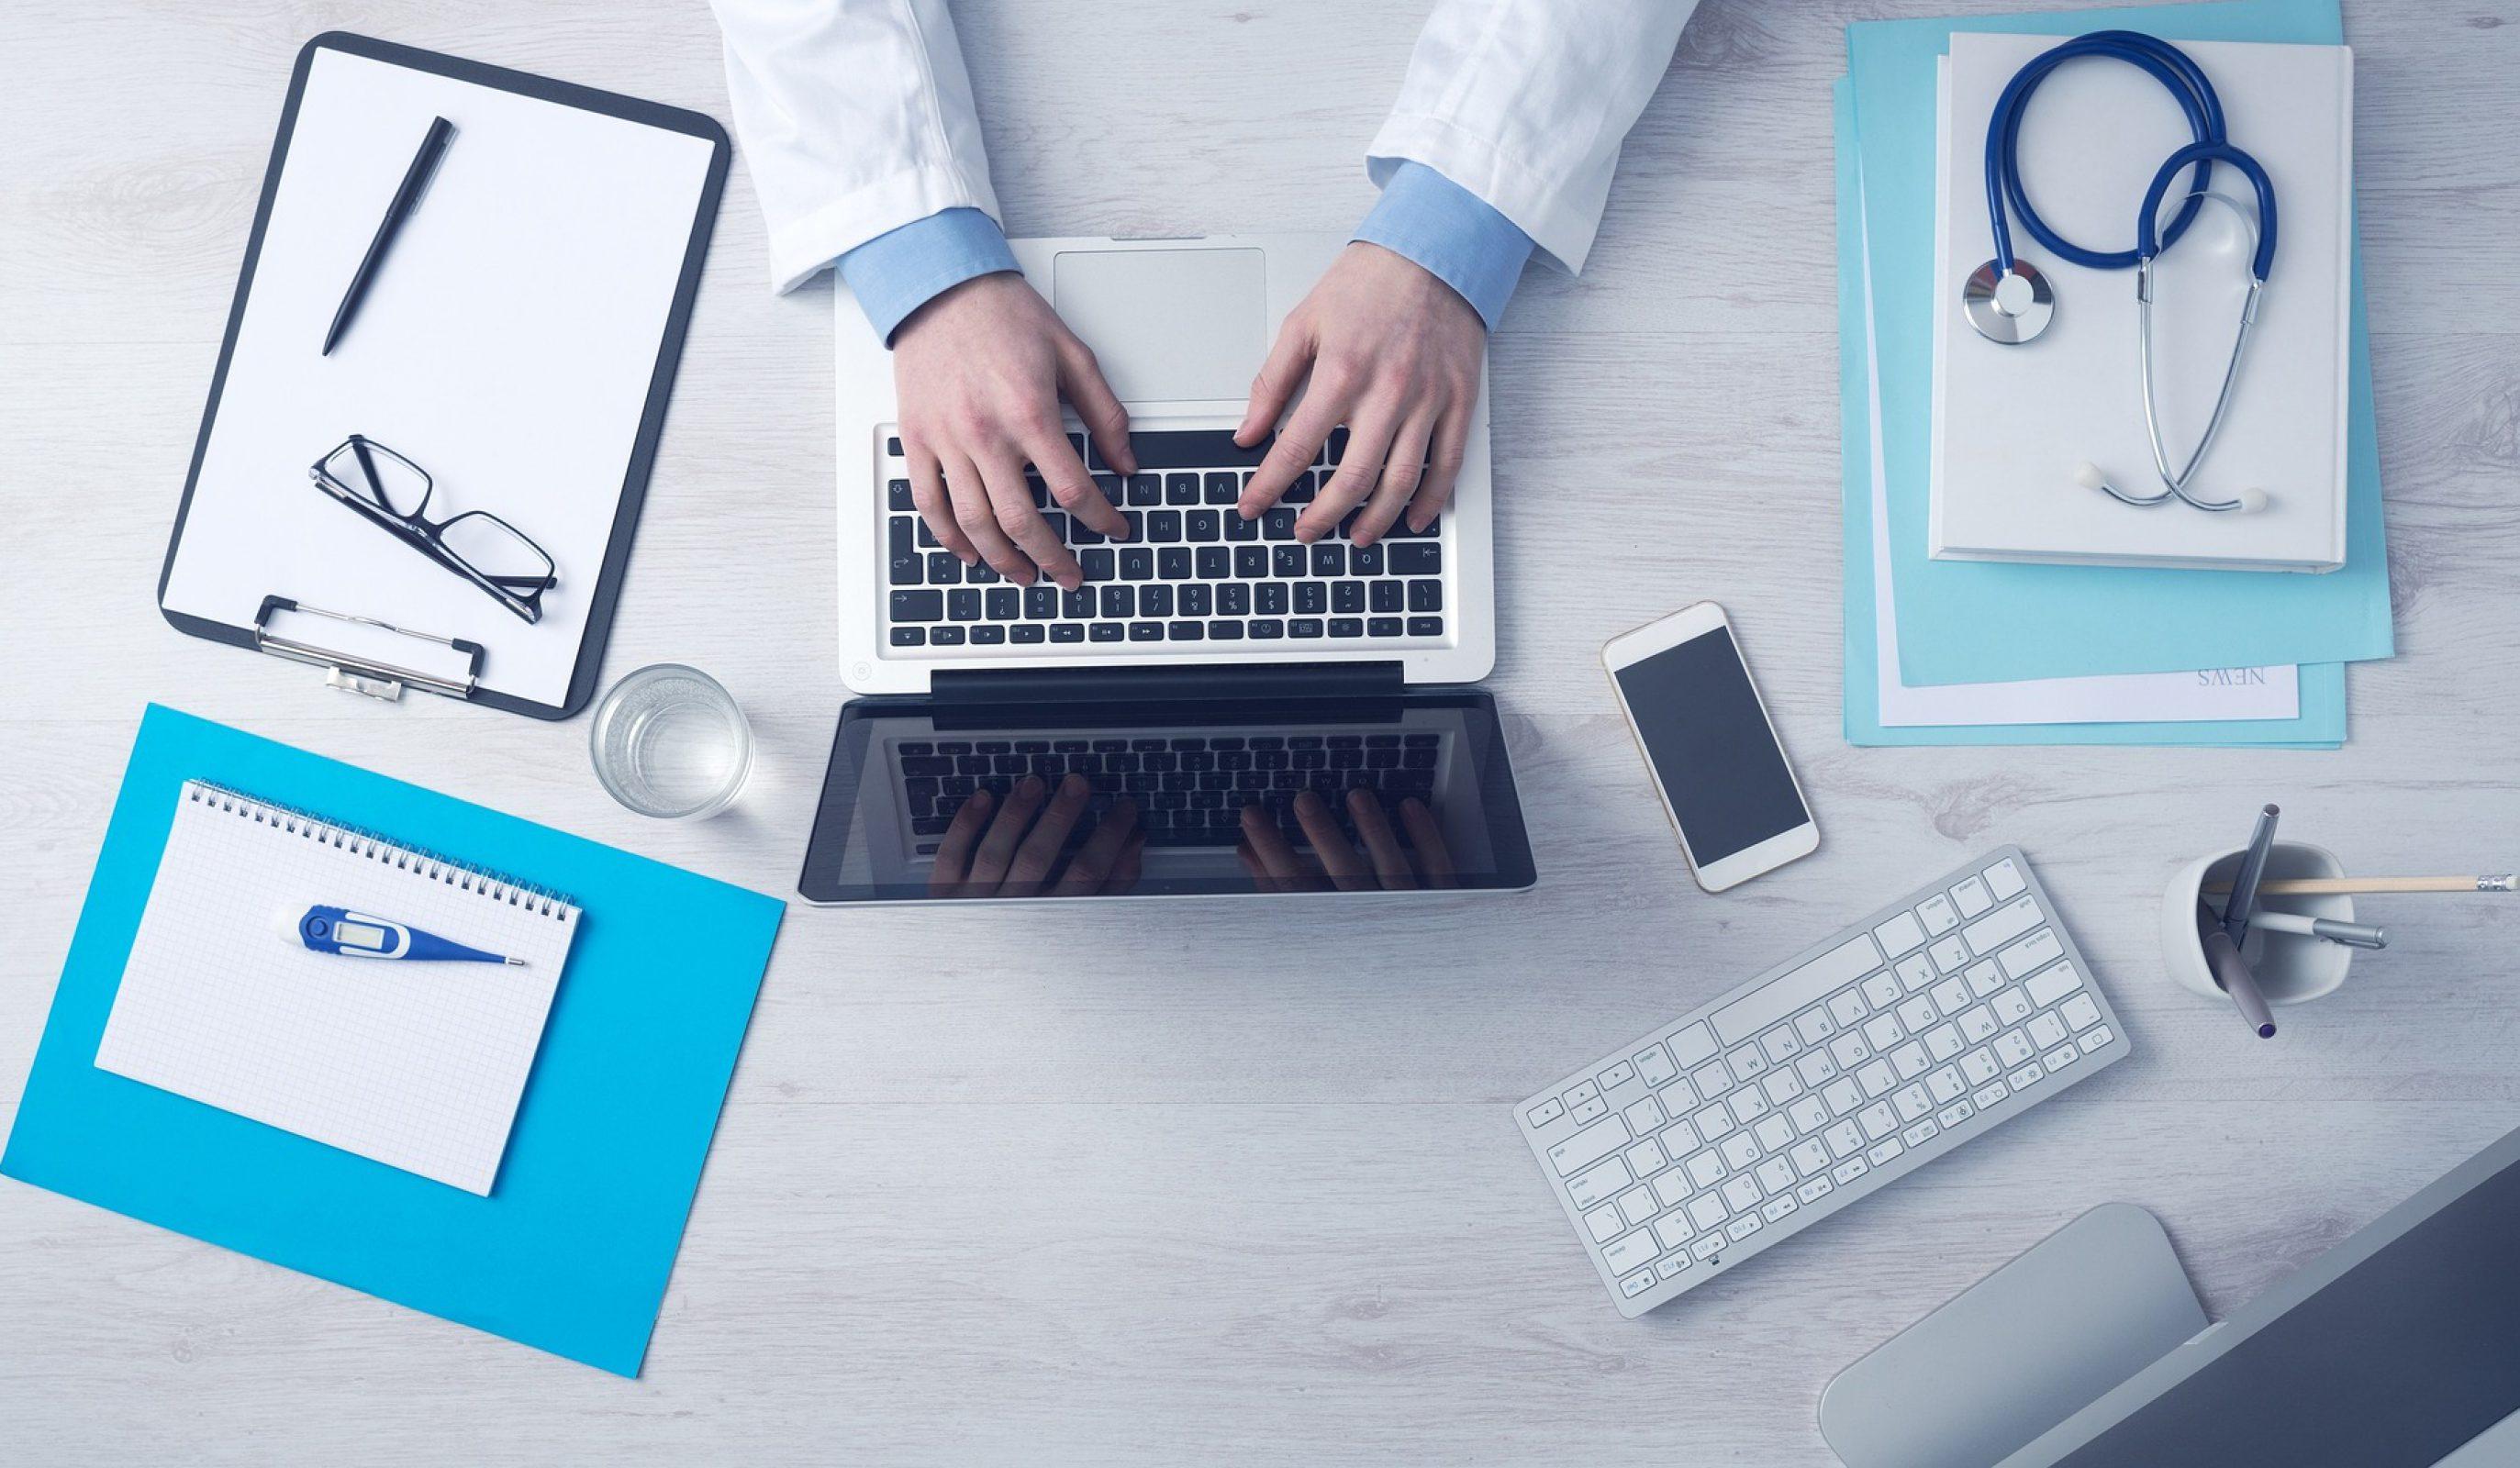 Doctor hands on computer